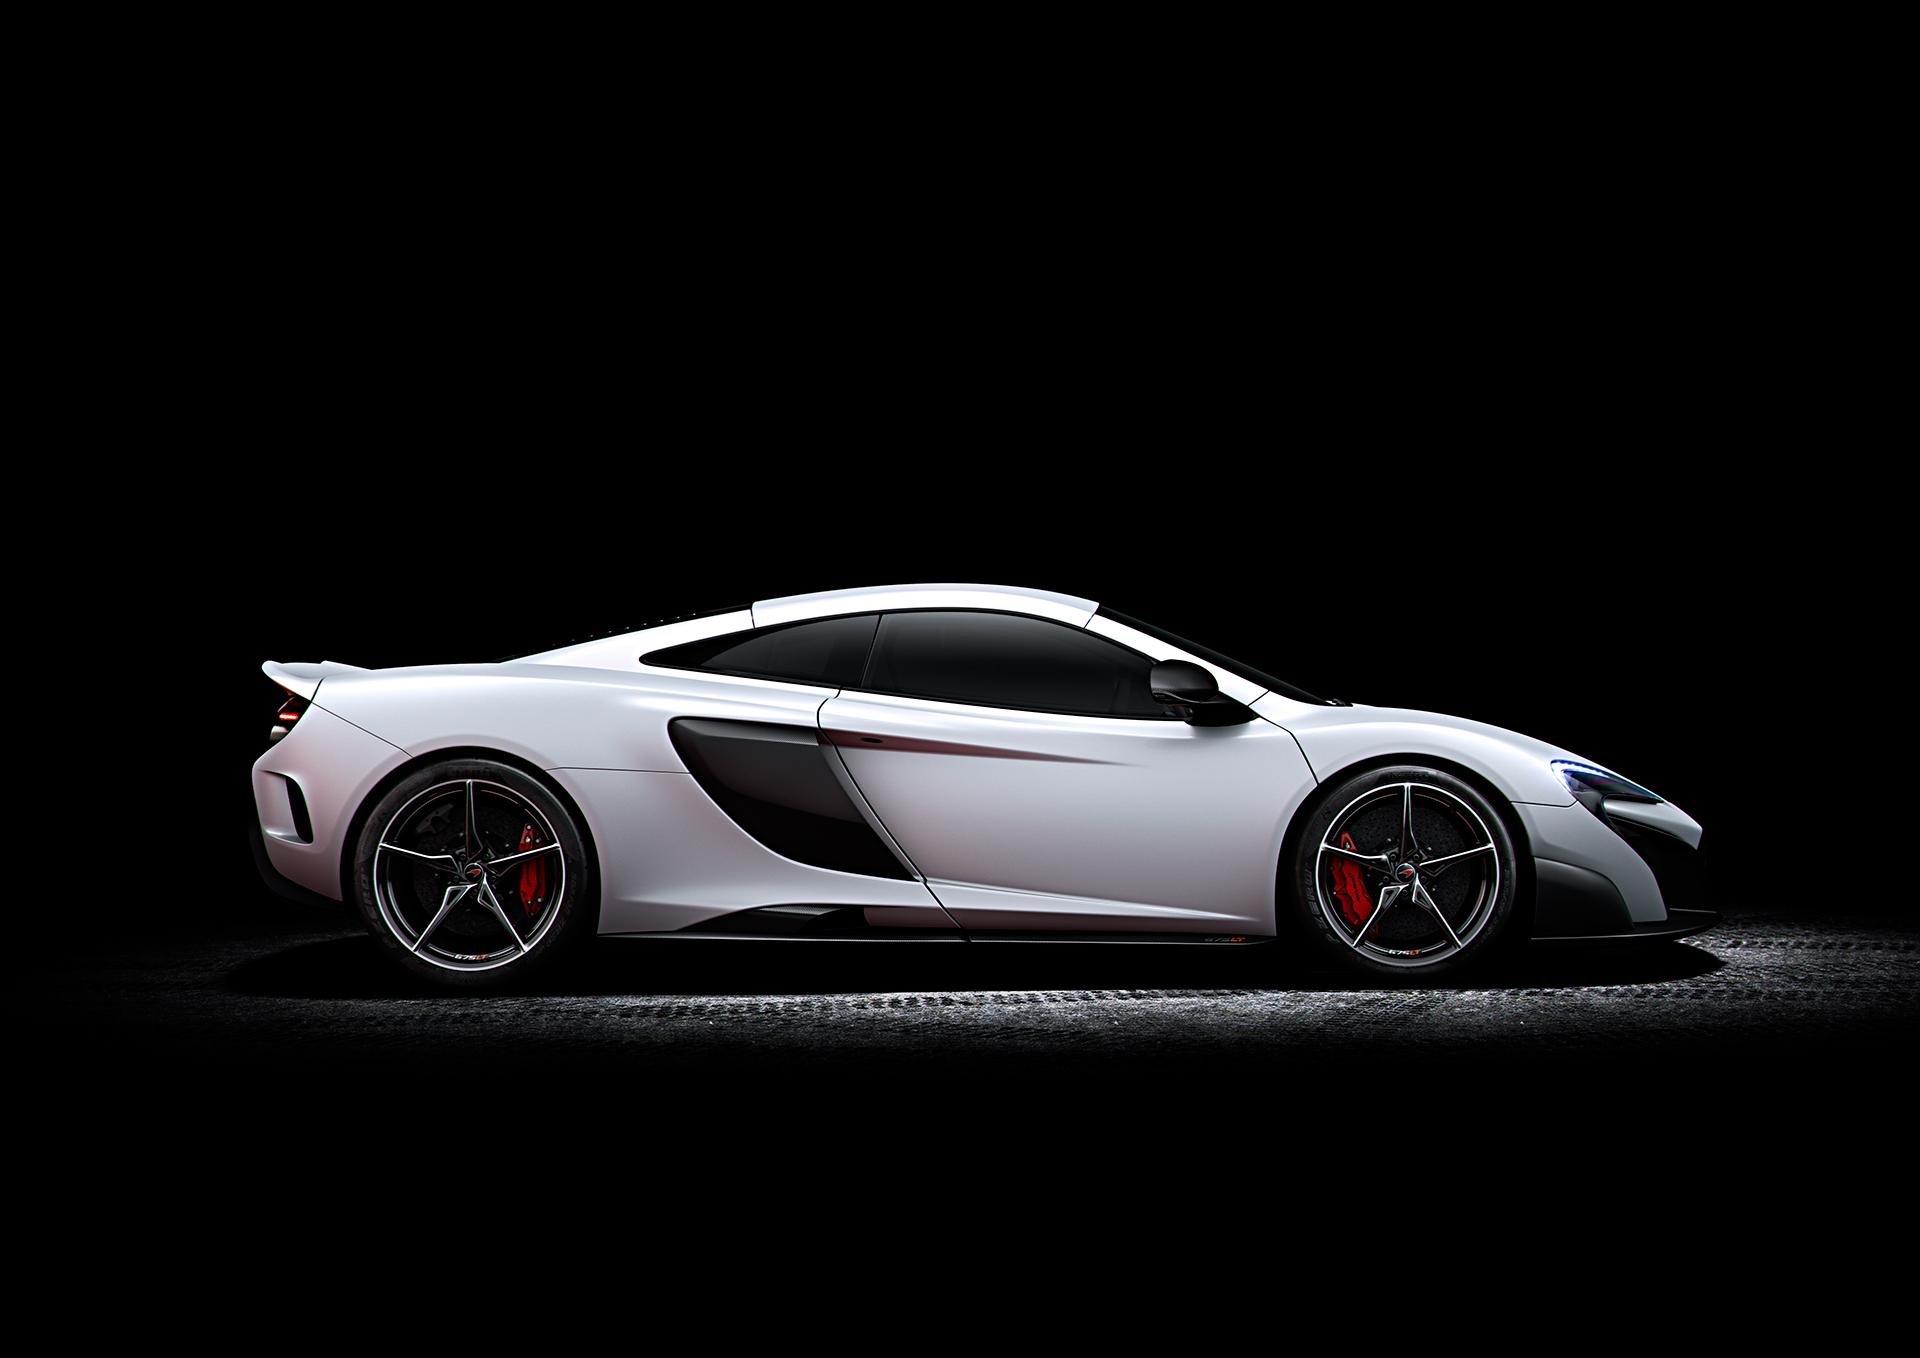 McLaren 675LT - profil